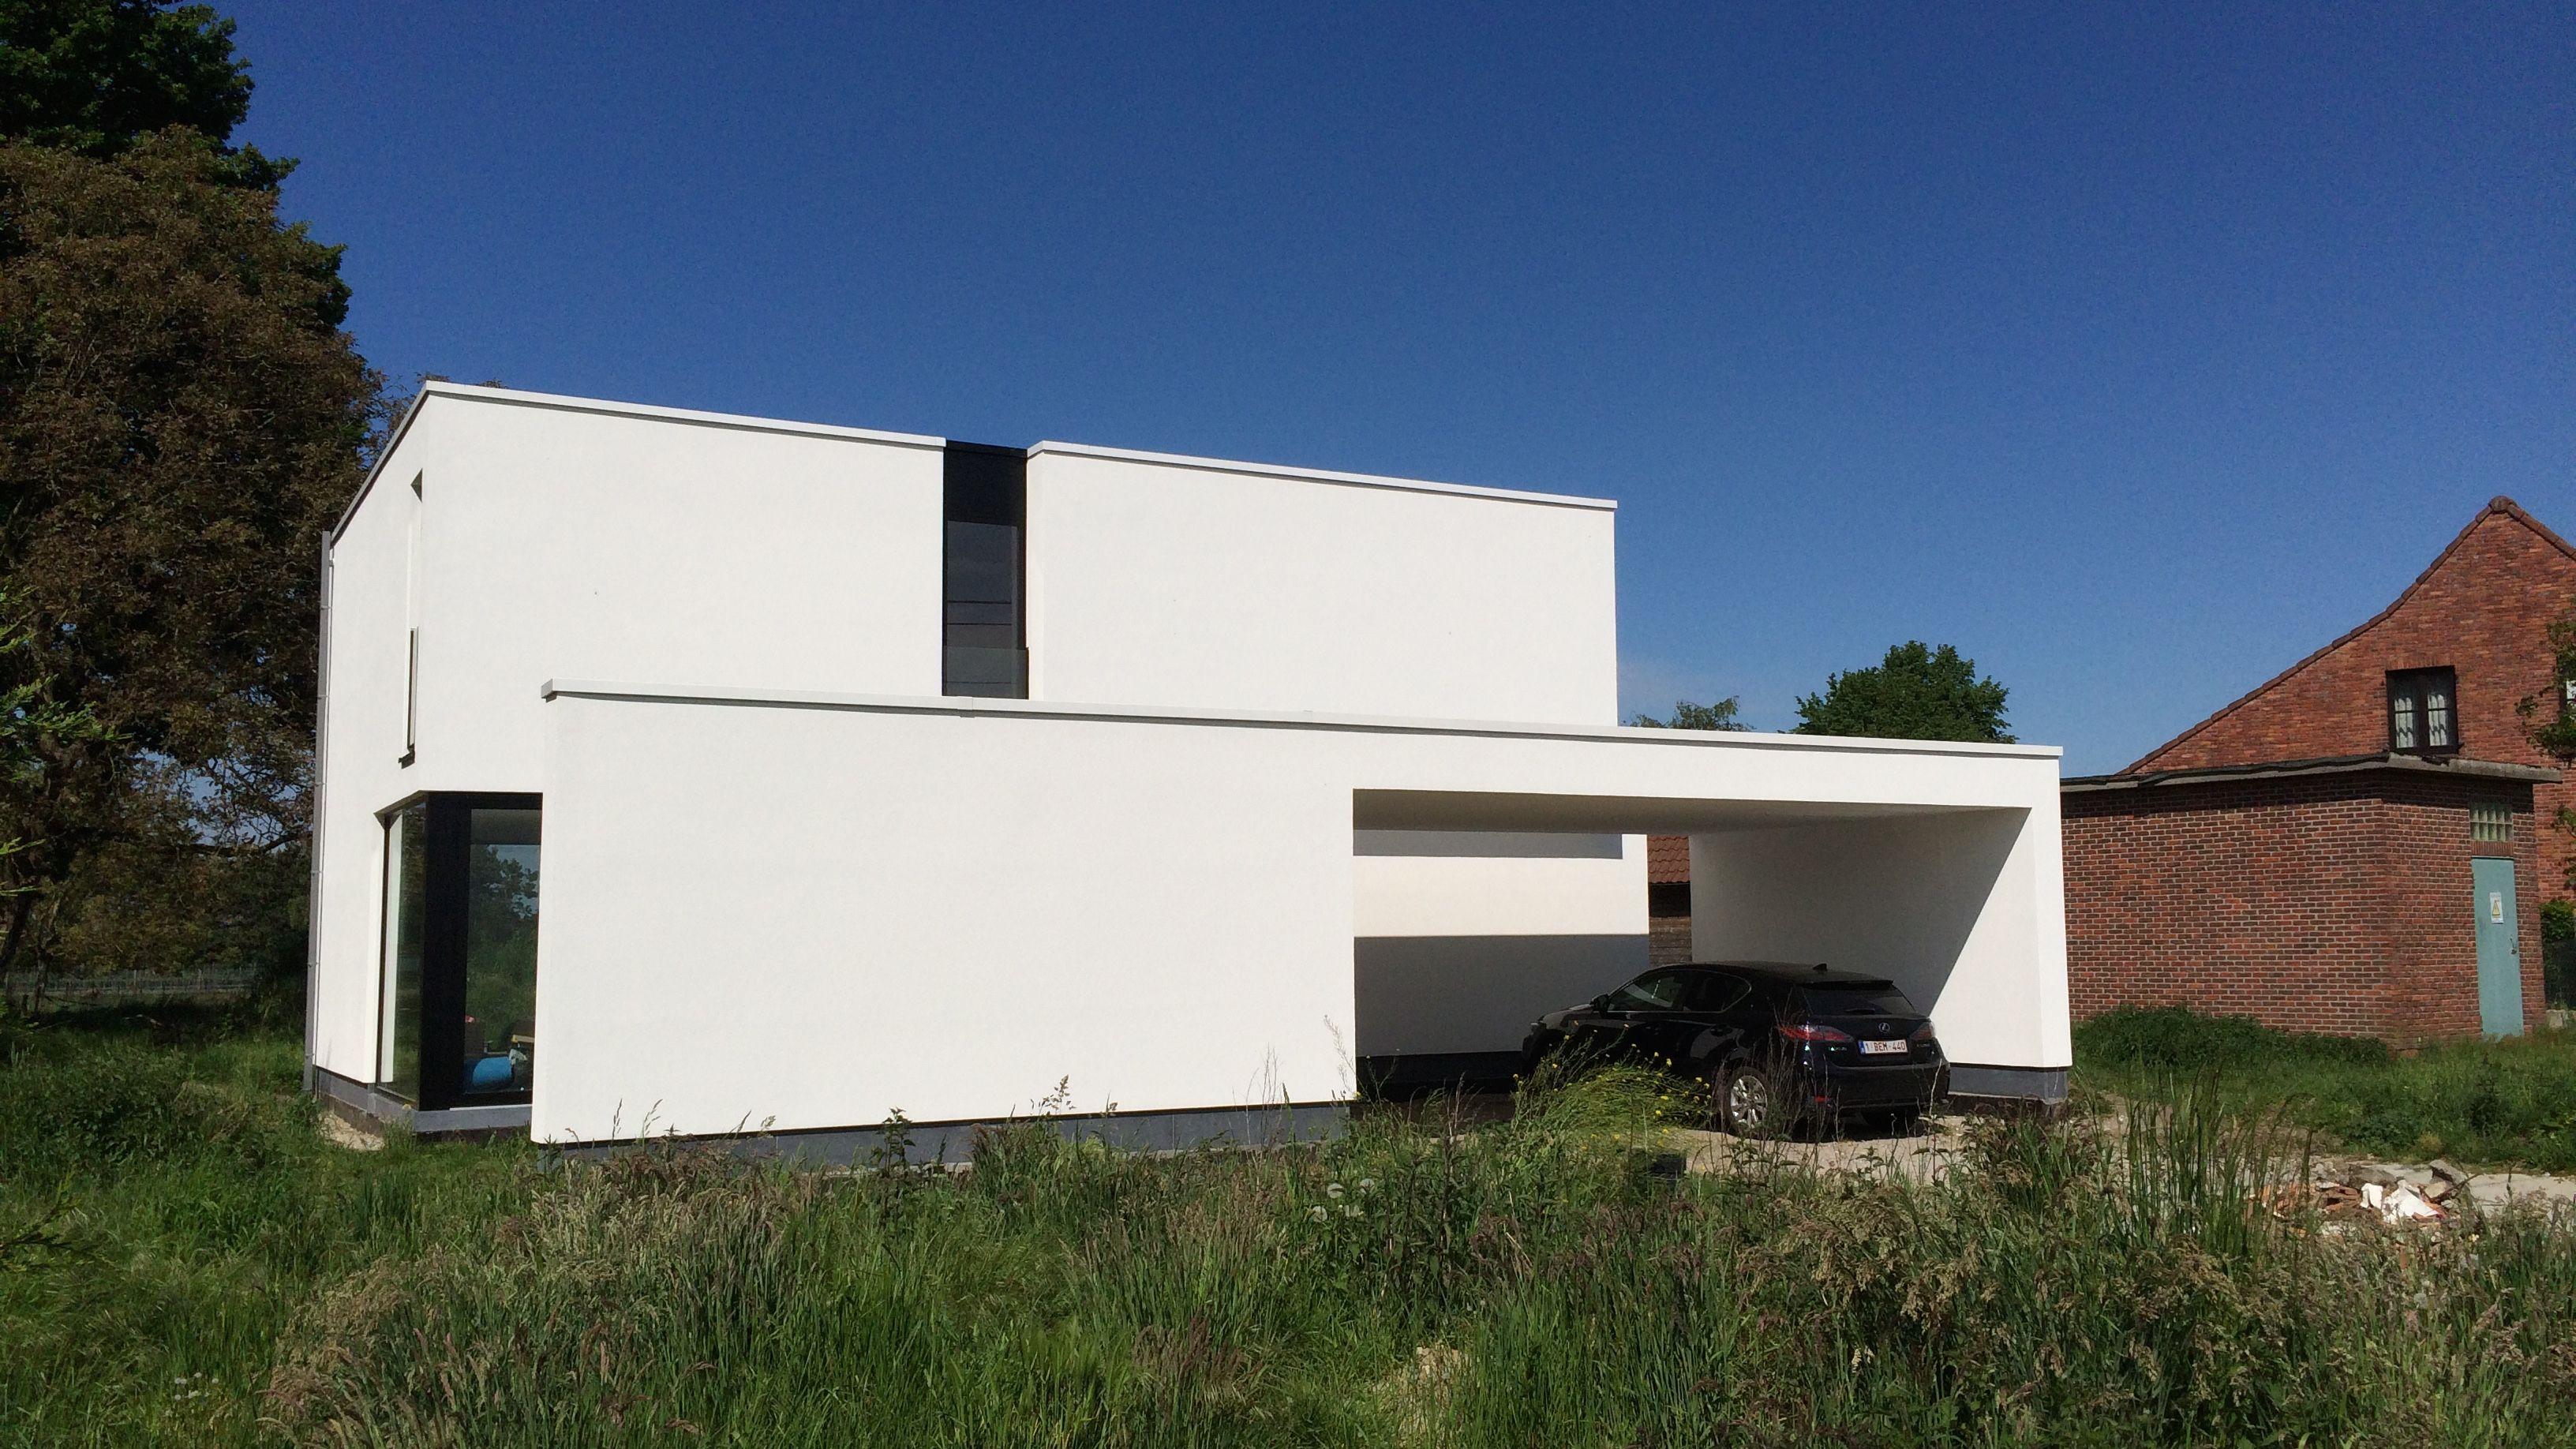 Modern & Minimalistic Low Energy House Een Dubbele Carport Biedt Tevens